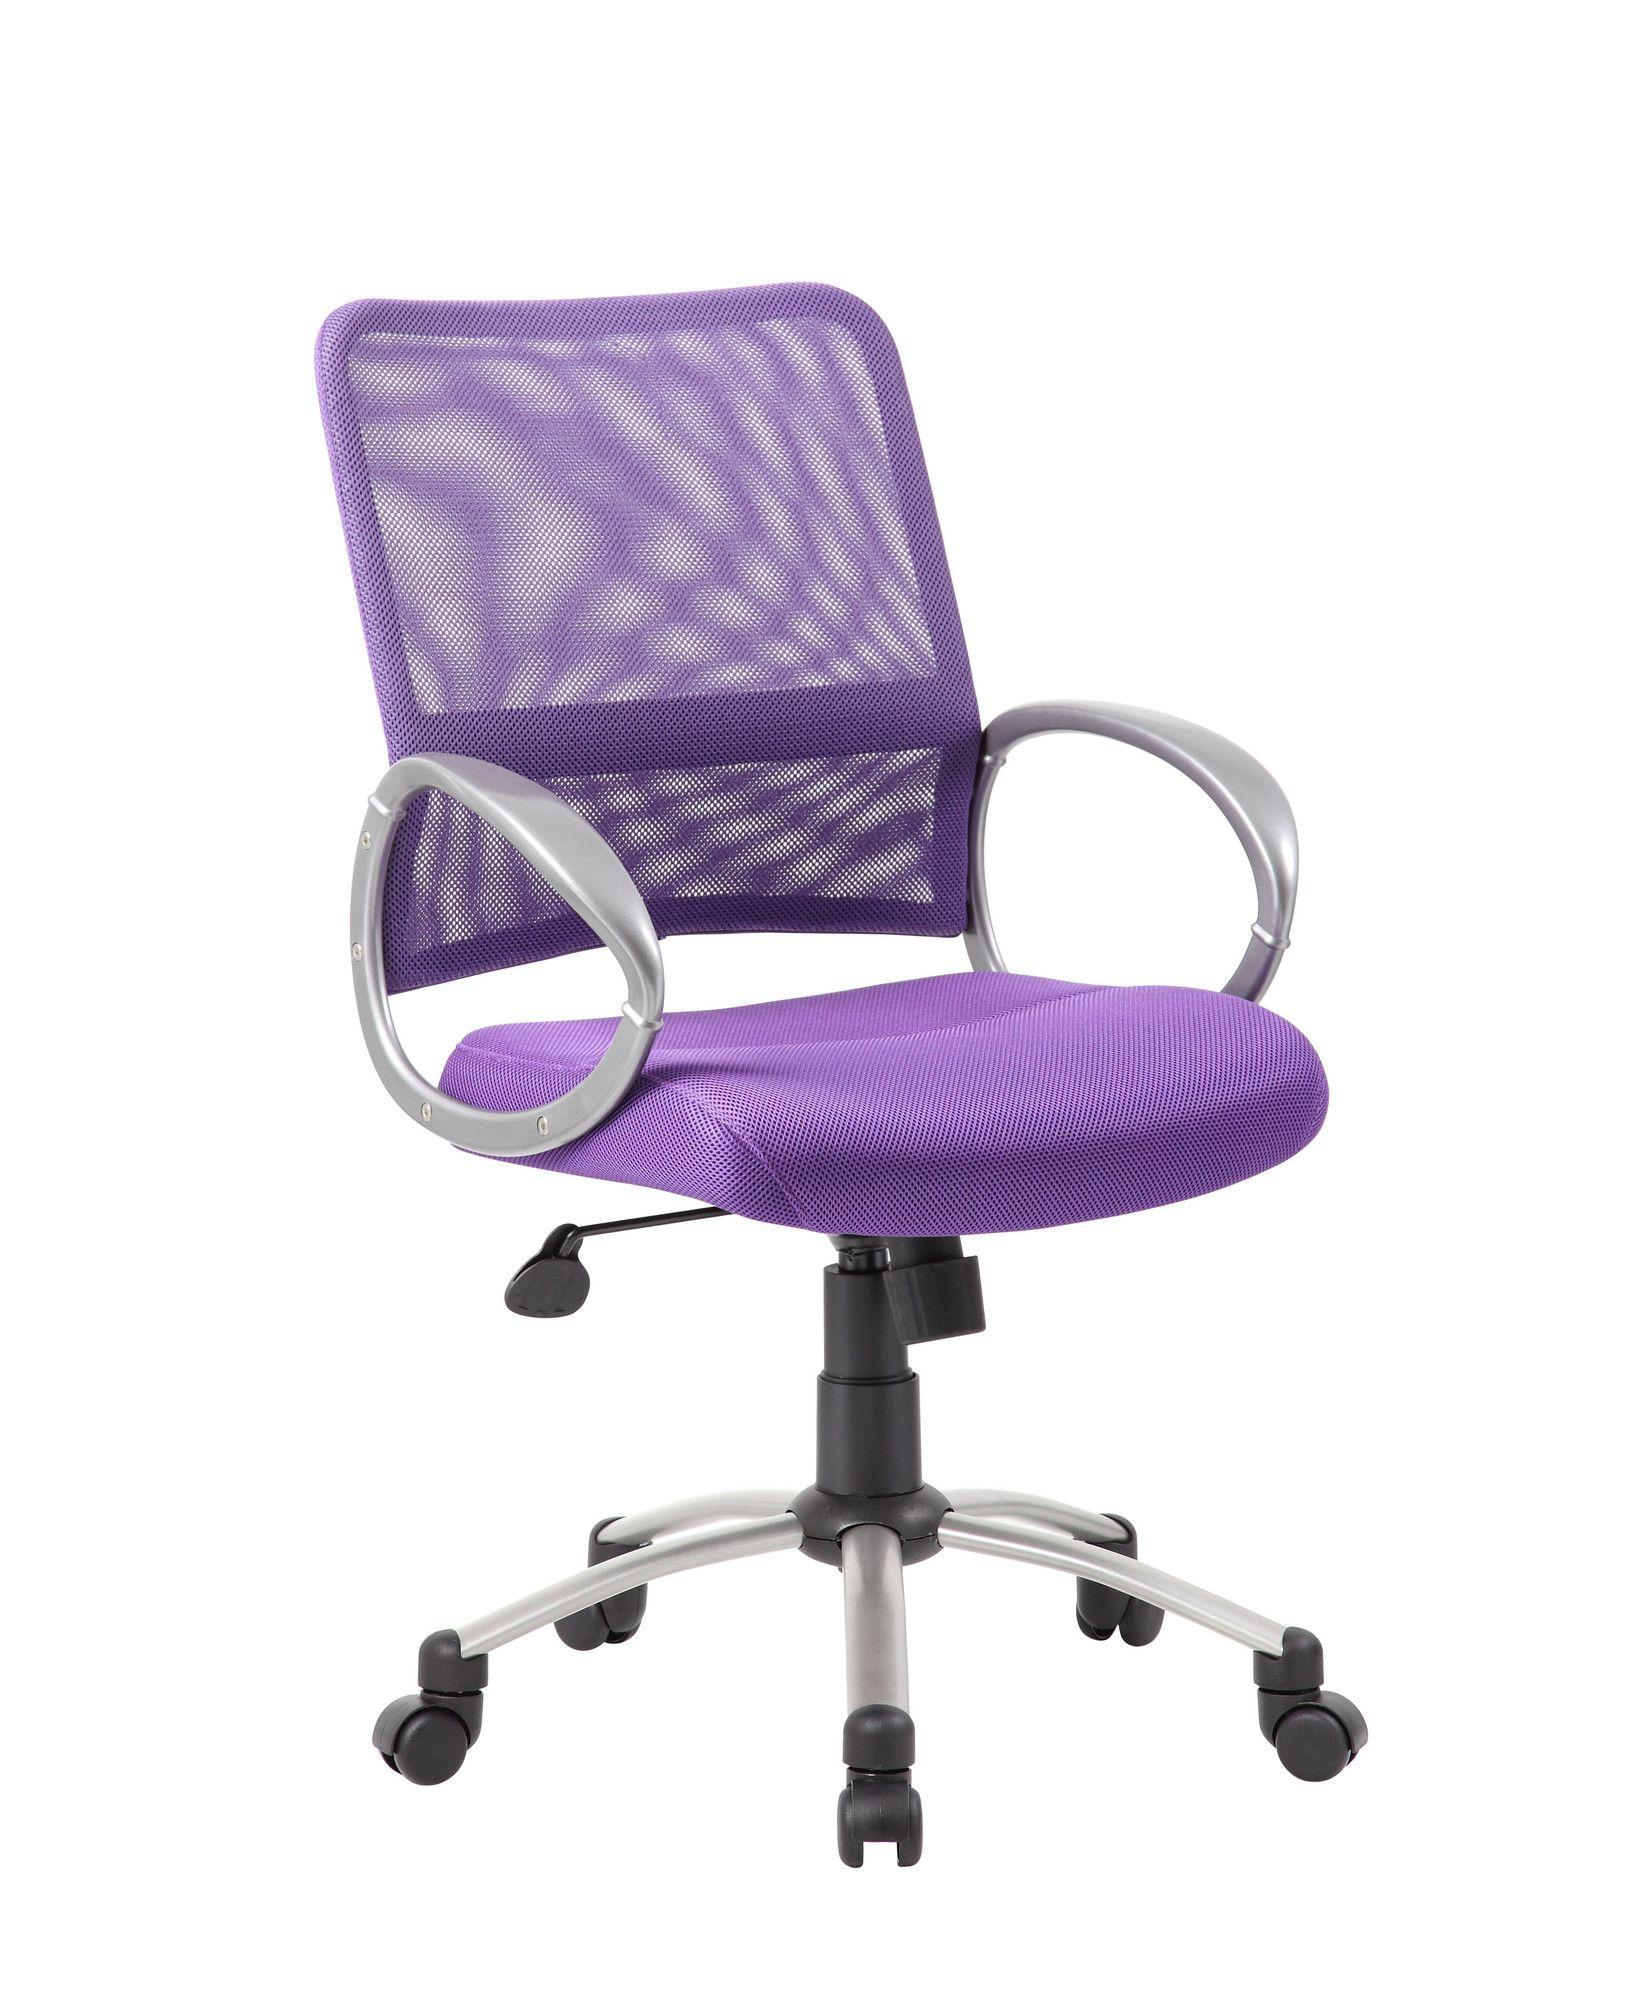 ChairSillones Task Mesh Used ChairSwivel Y Tenafly oexBdC